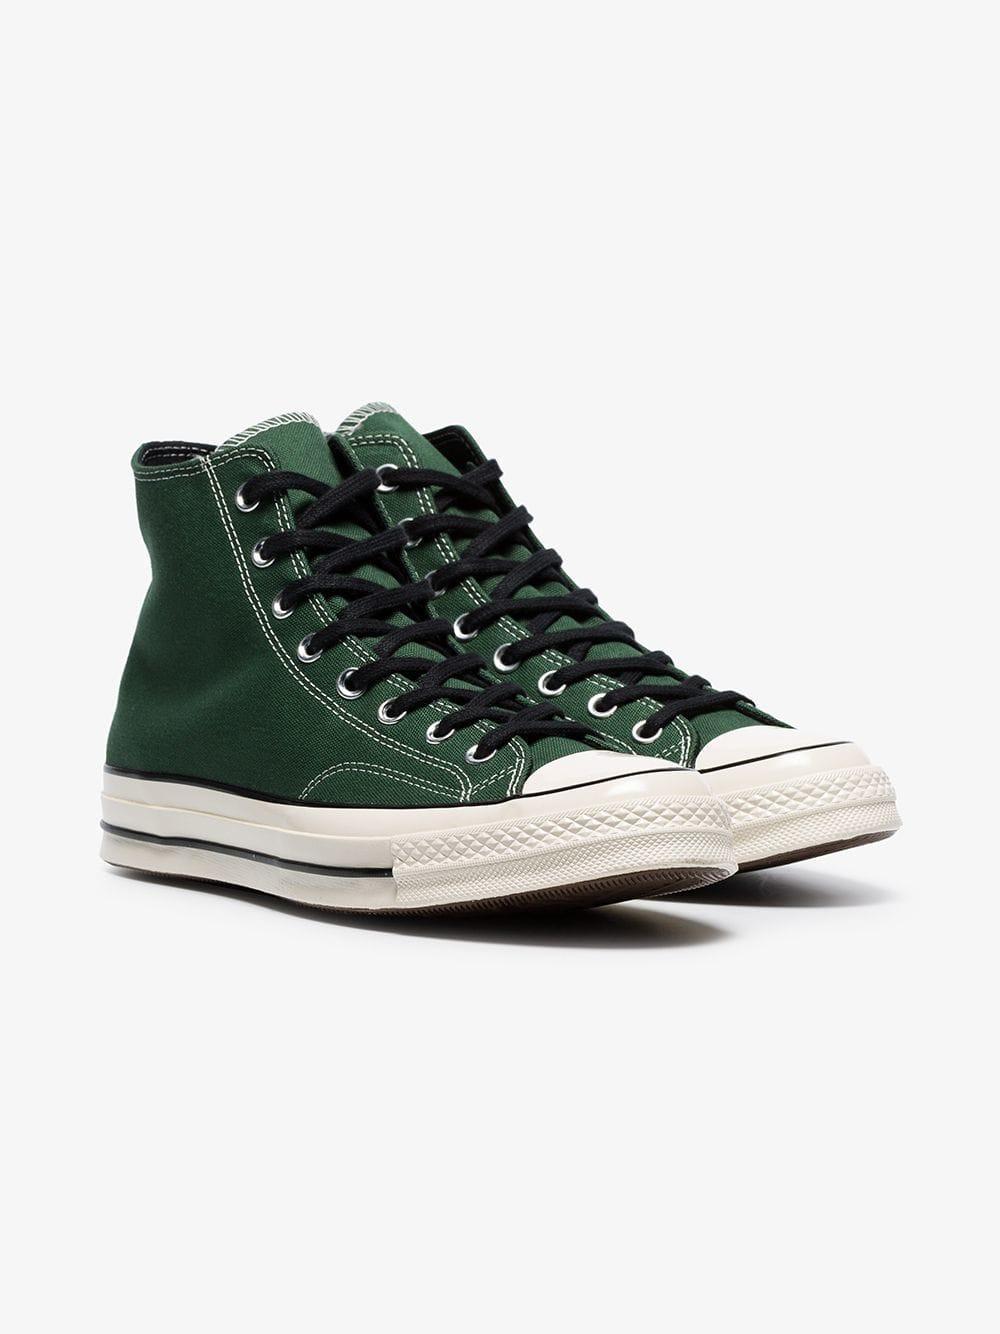 Converse - Green Chuck Taylor All Stars 70 s Sneakers for Men - Lyst. View  fullscreen ca5c955d1